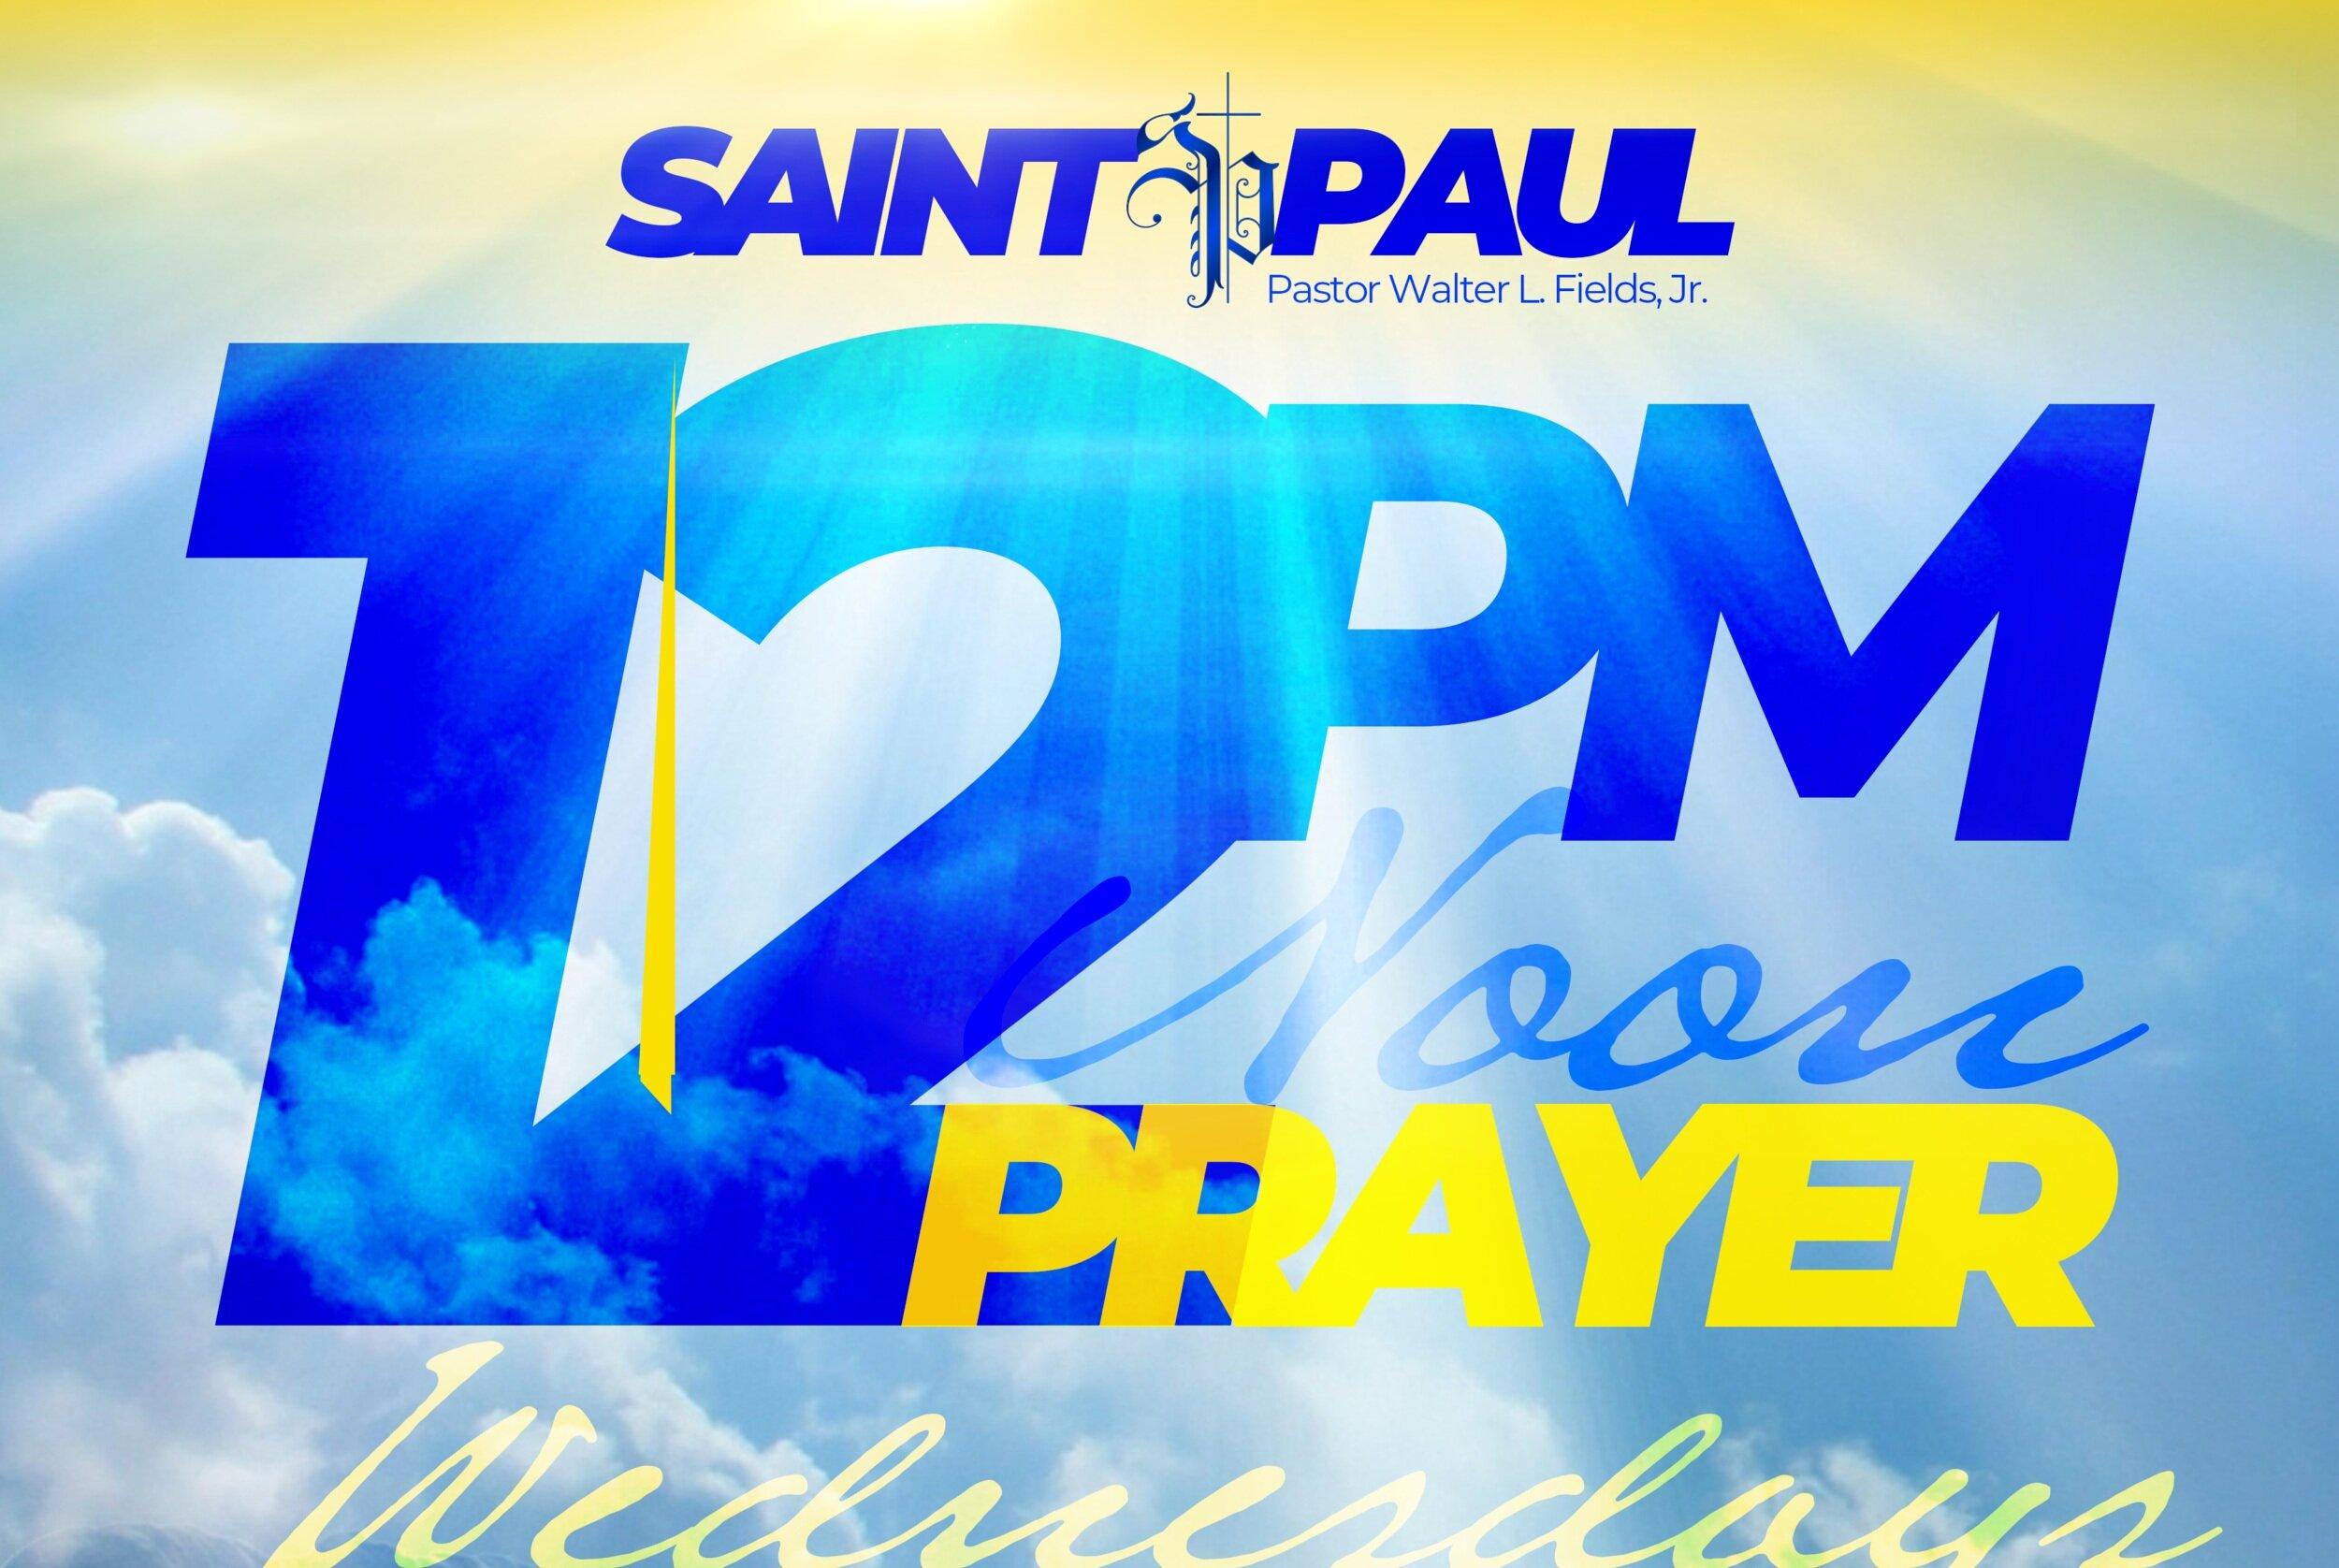 WEDNESDAY PRAYER - 1 Hour. Noon - 1pm on Wednesdays.